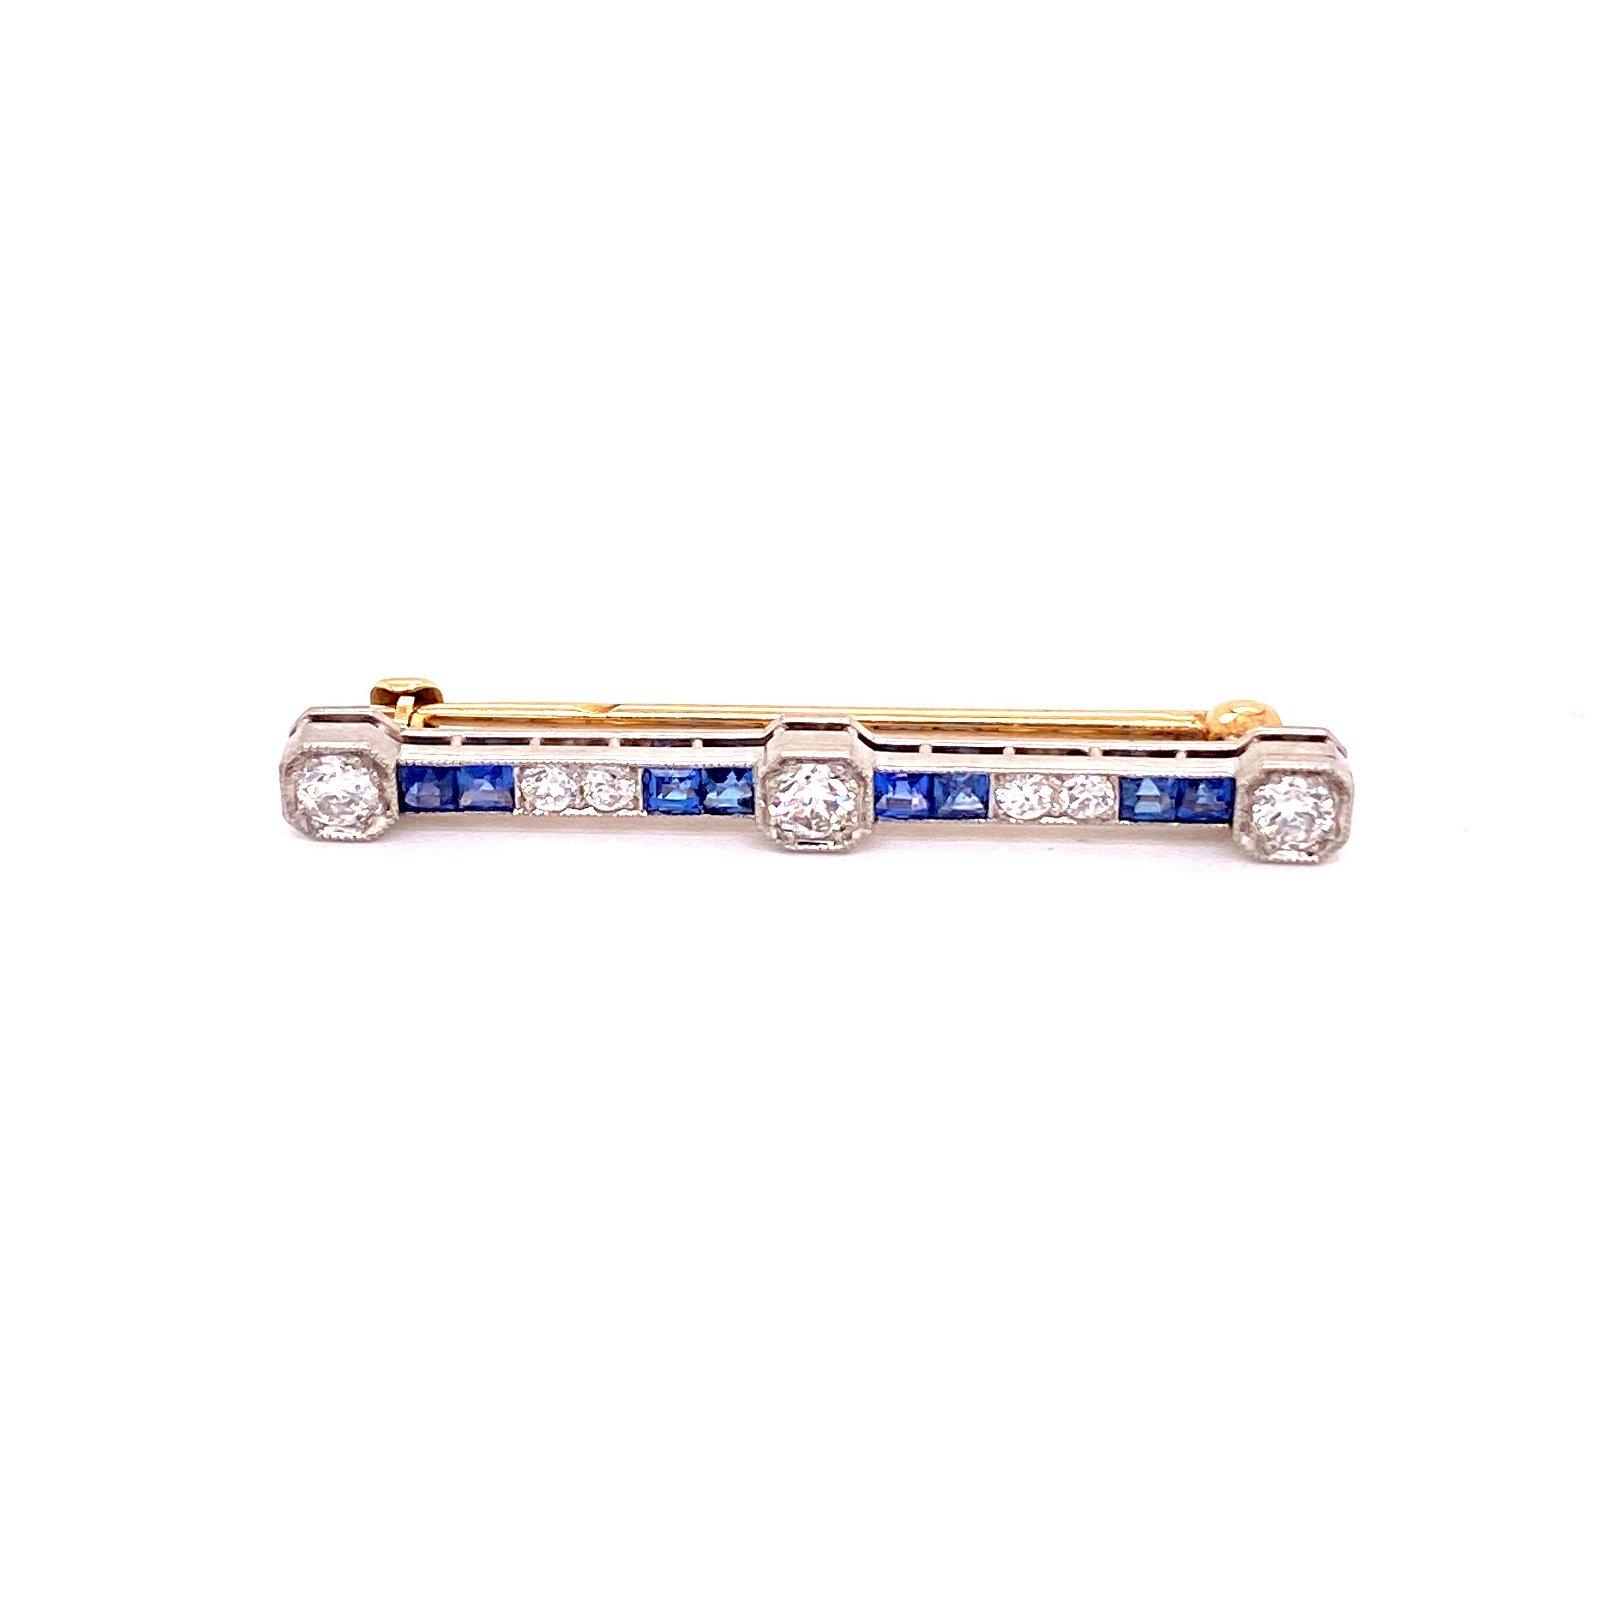 Edwardian French 18k Gold Diamonds Sapphire Brooch